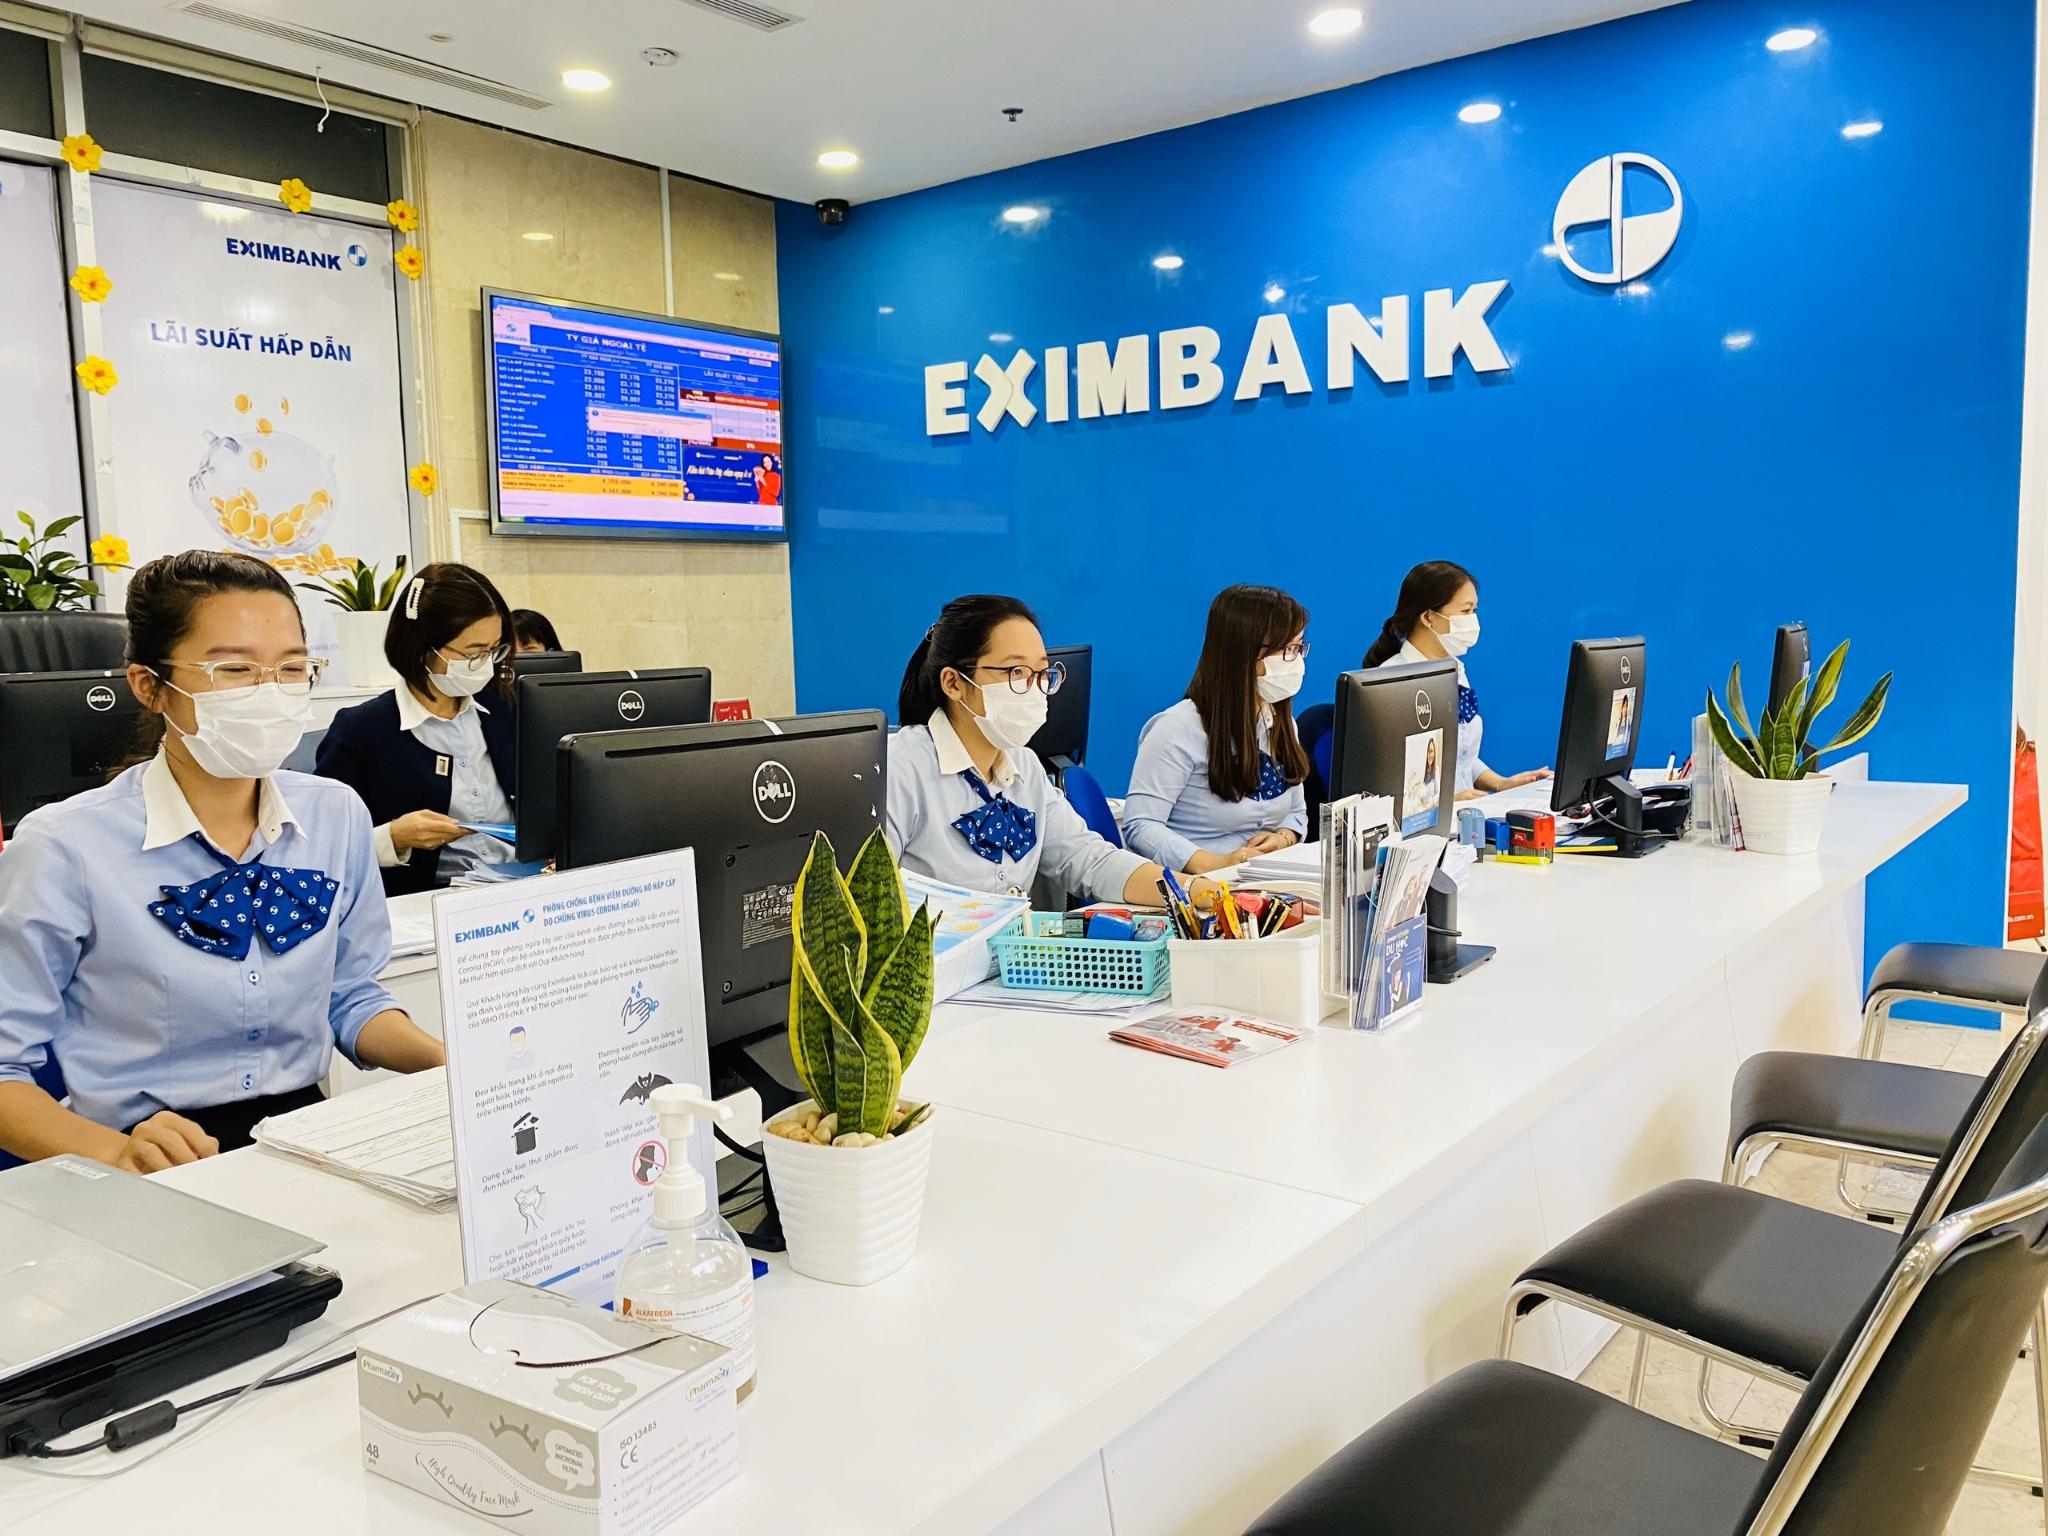 Dịch vụ ecom của Eximbank